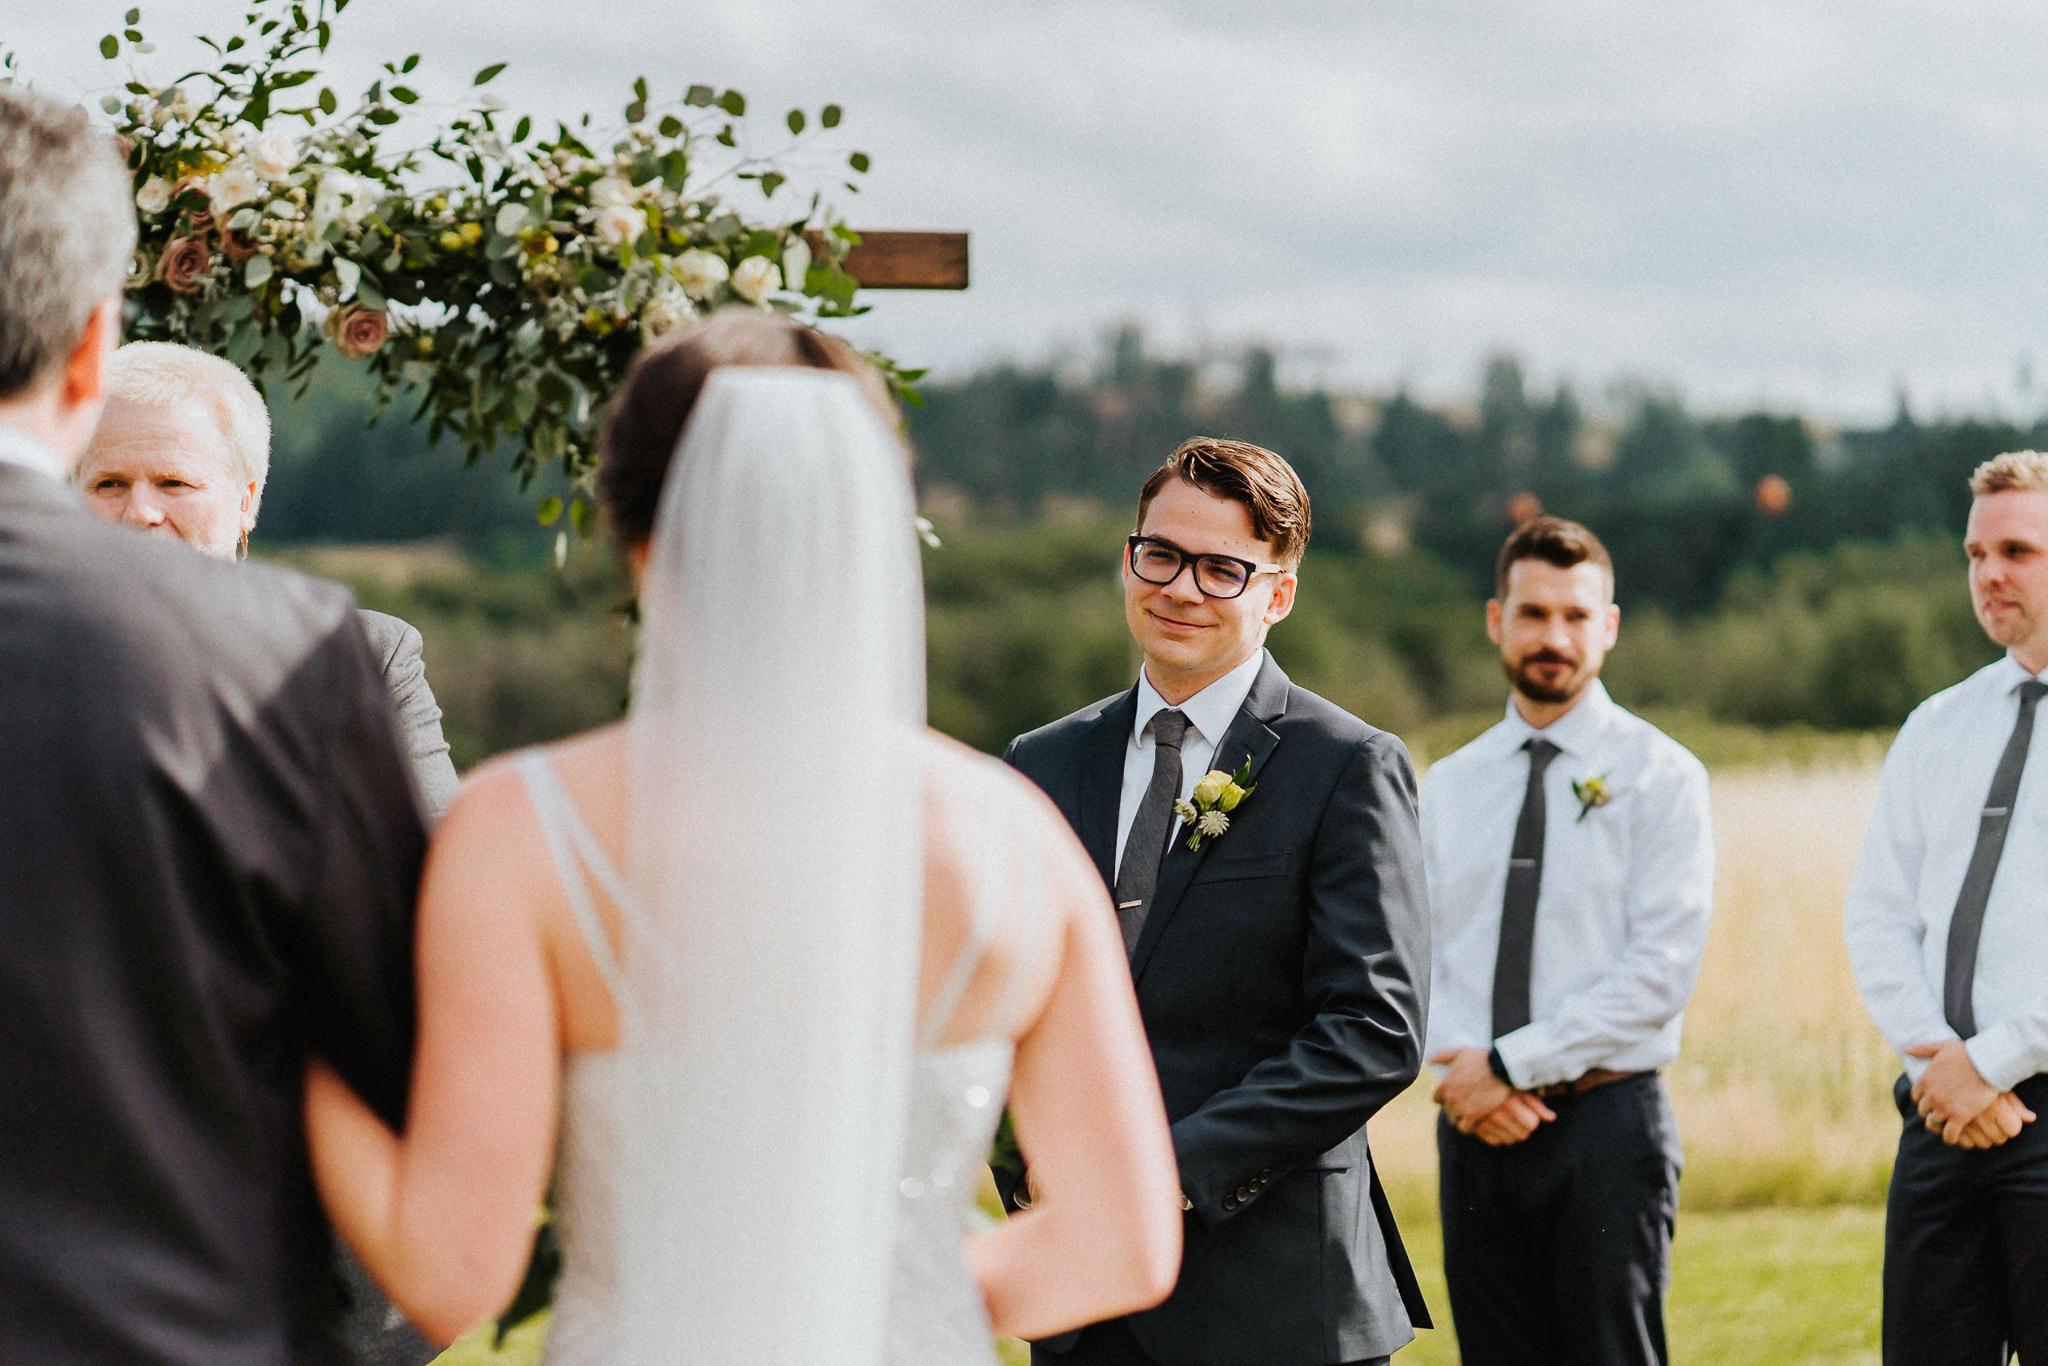 Groom Candid smile bride alter Water Oasis